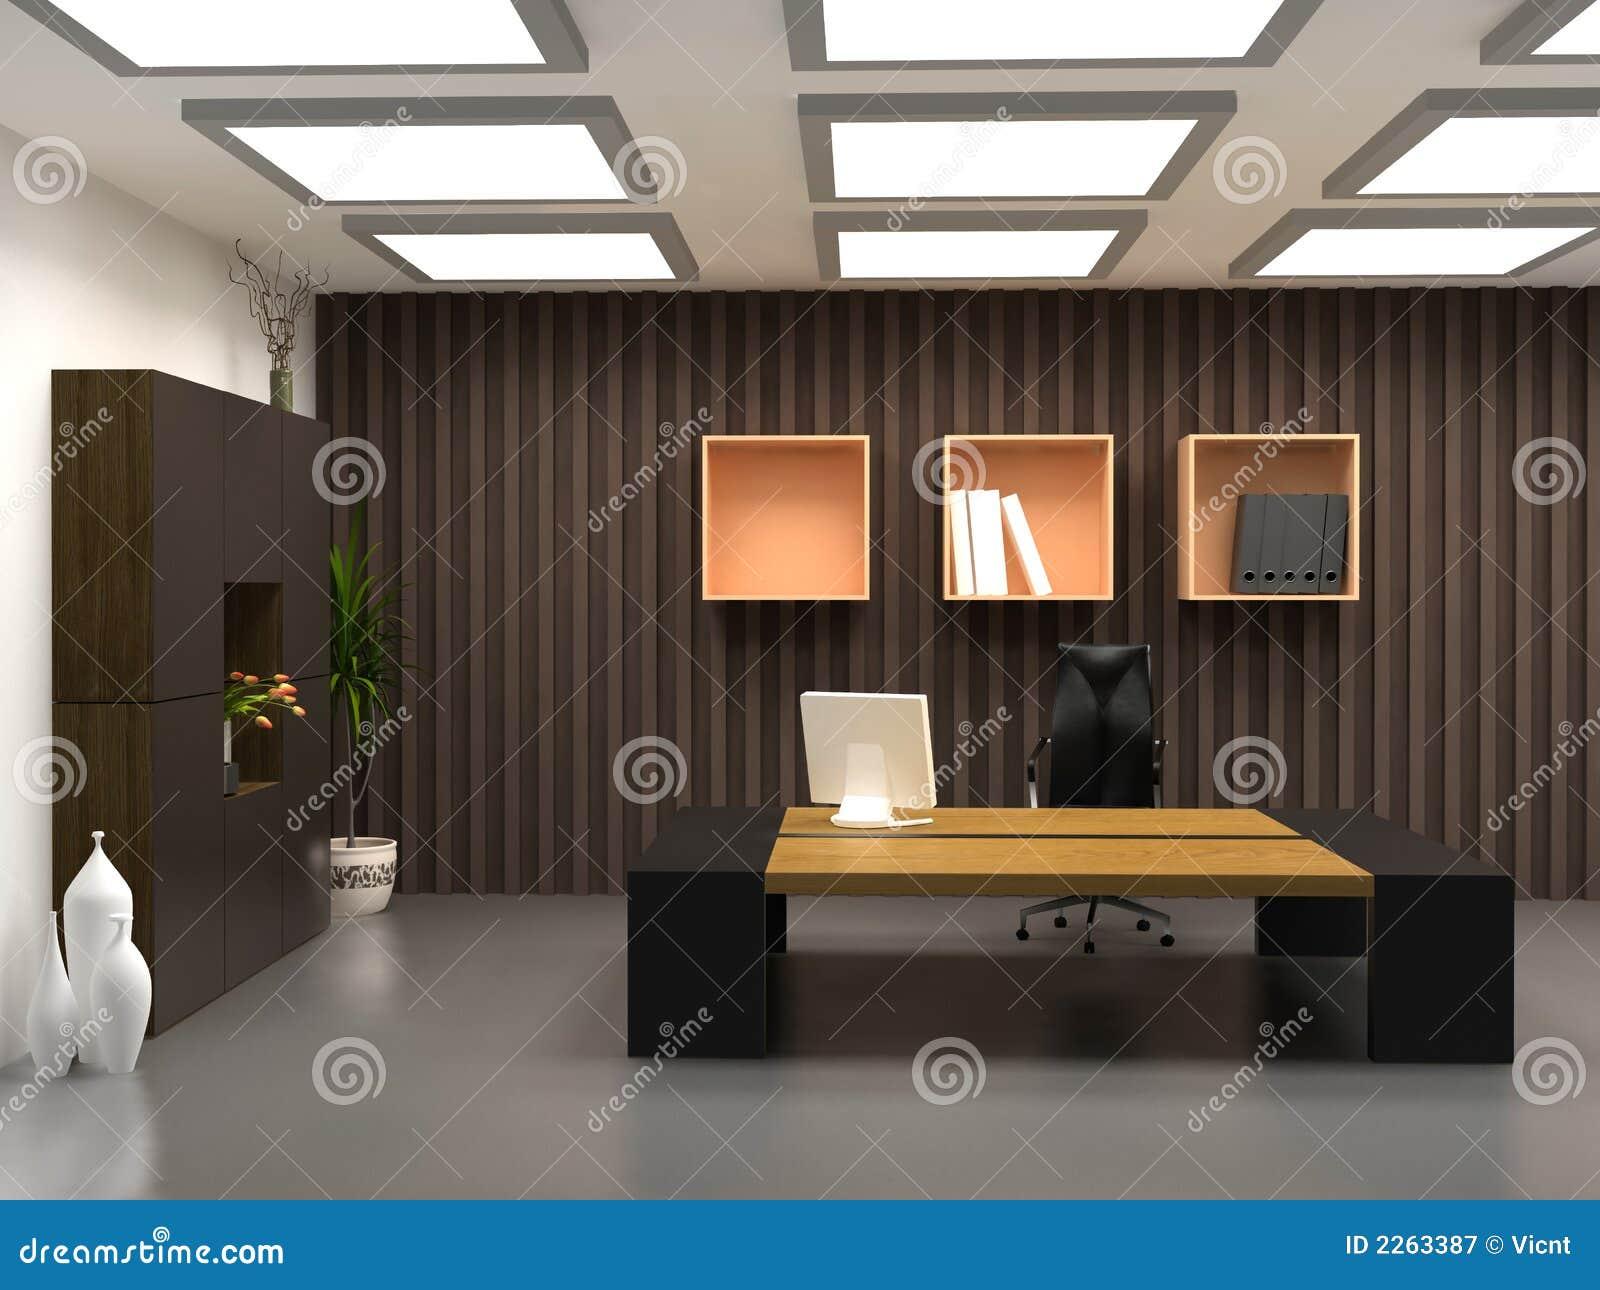 Das moderne Büro stockbild. Bild von möbel, arbeit, tabellen - 2263387